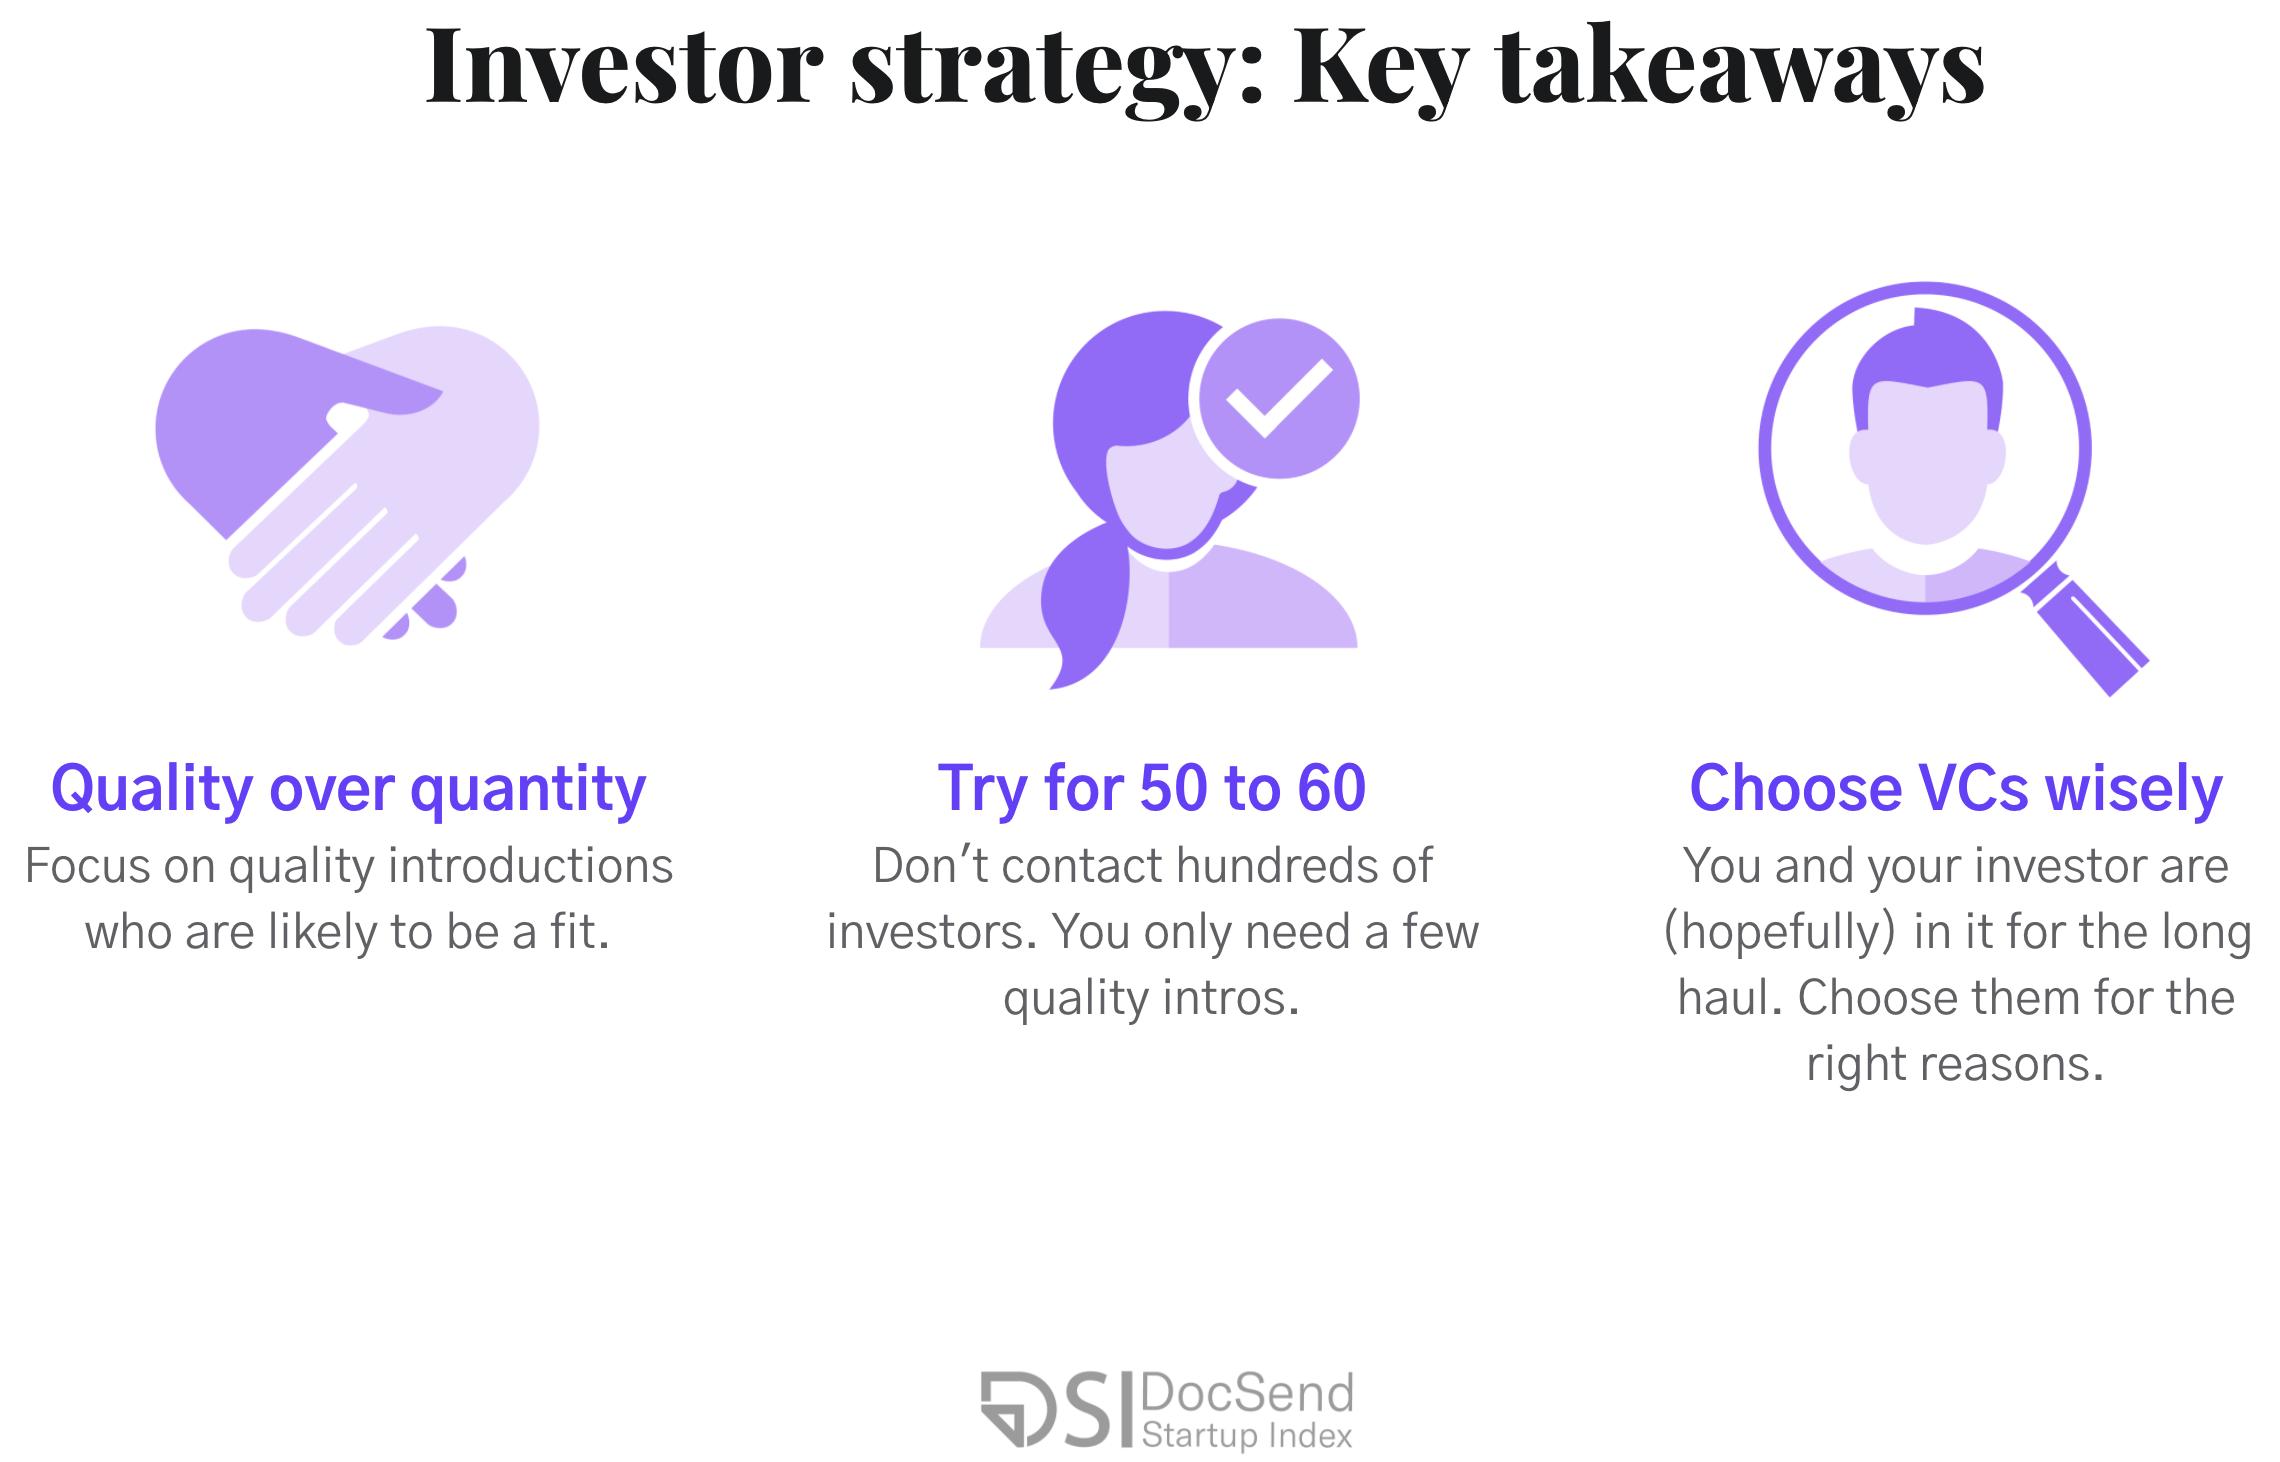 Pre-seed Investor strategy: Key takeaways